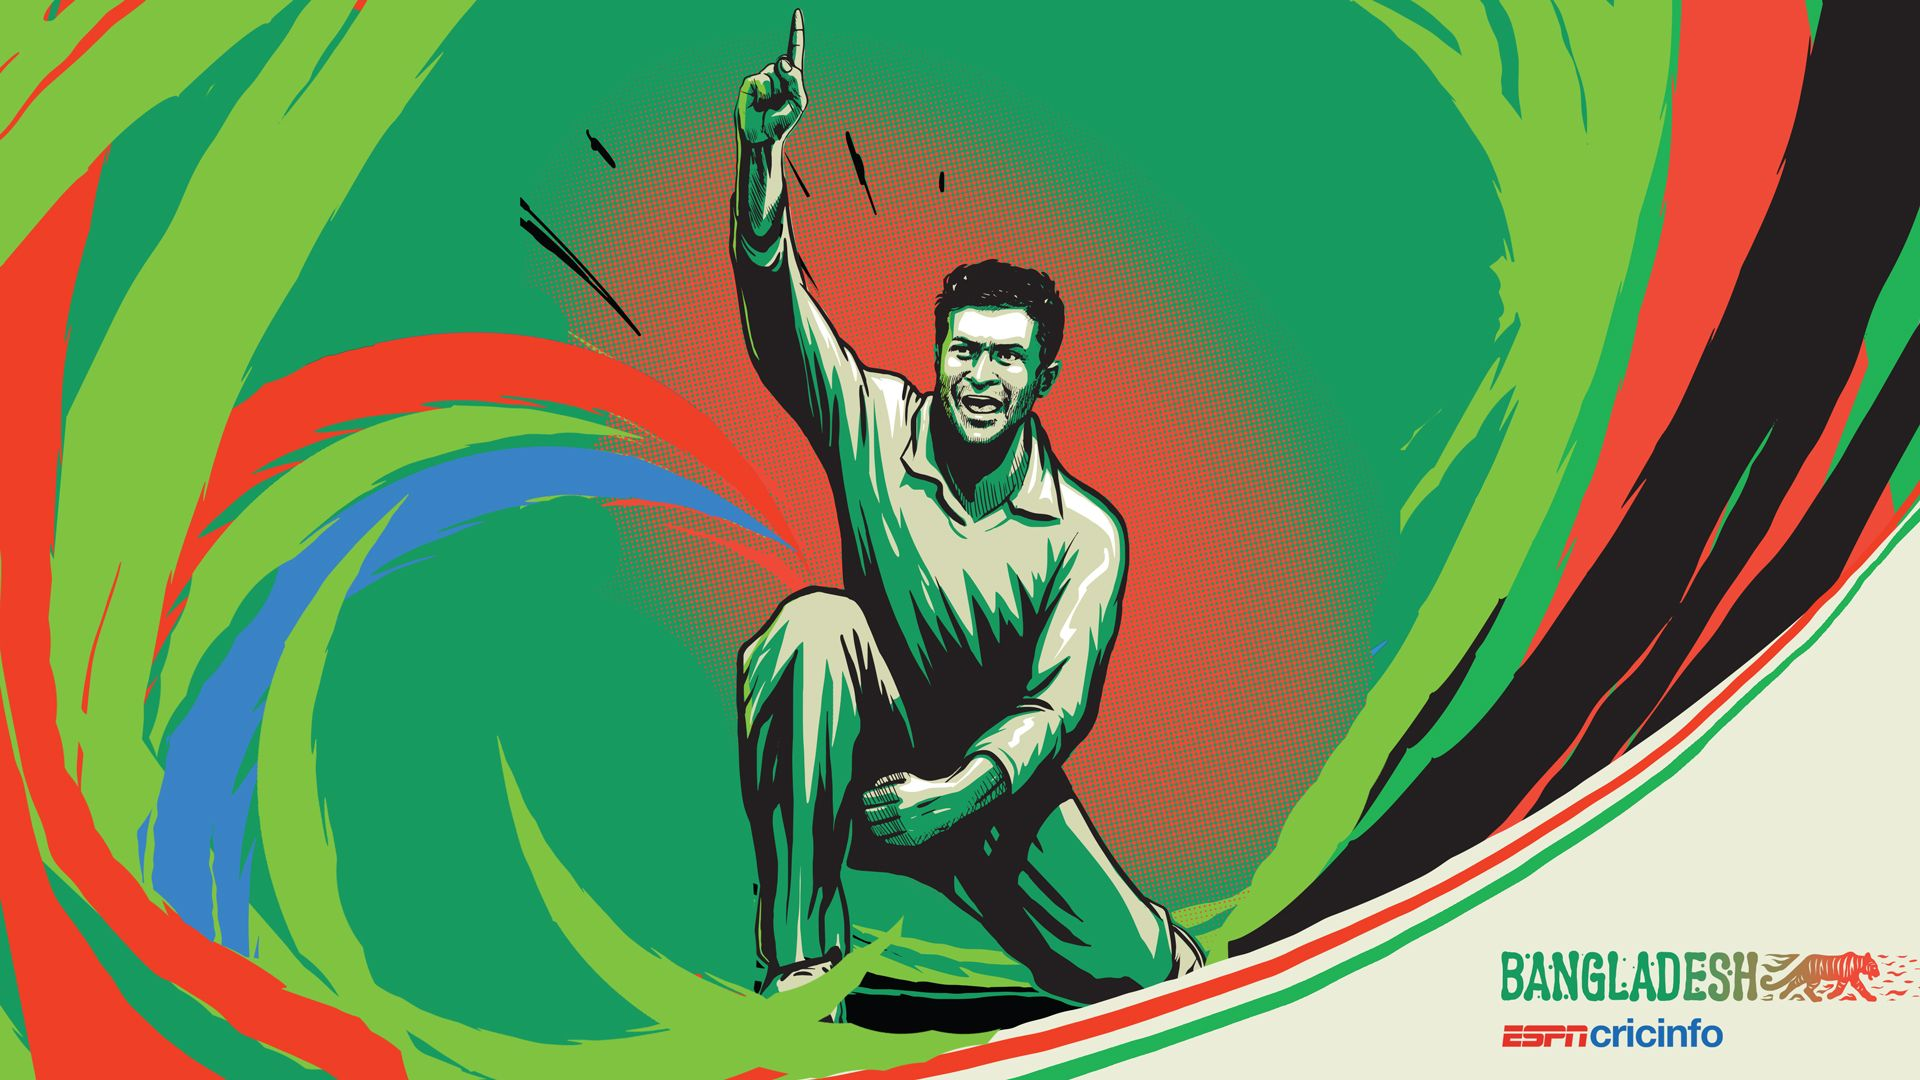 Bangladeshi Cricket Team Teams Background 2